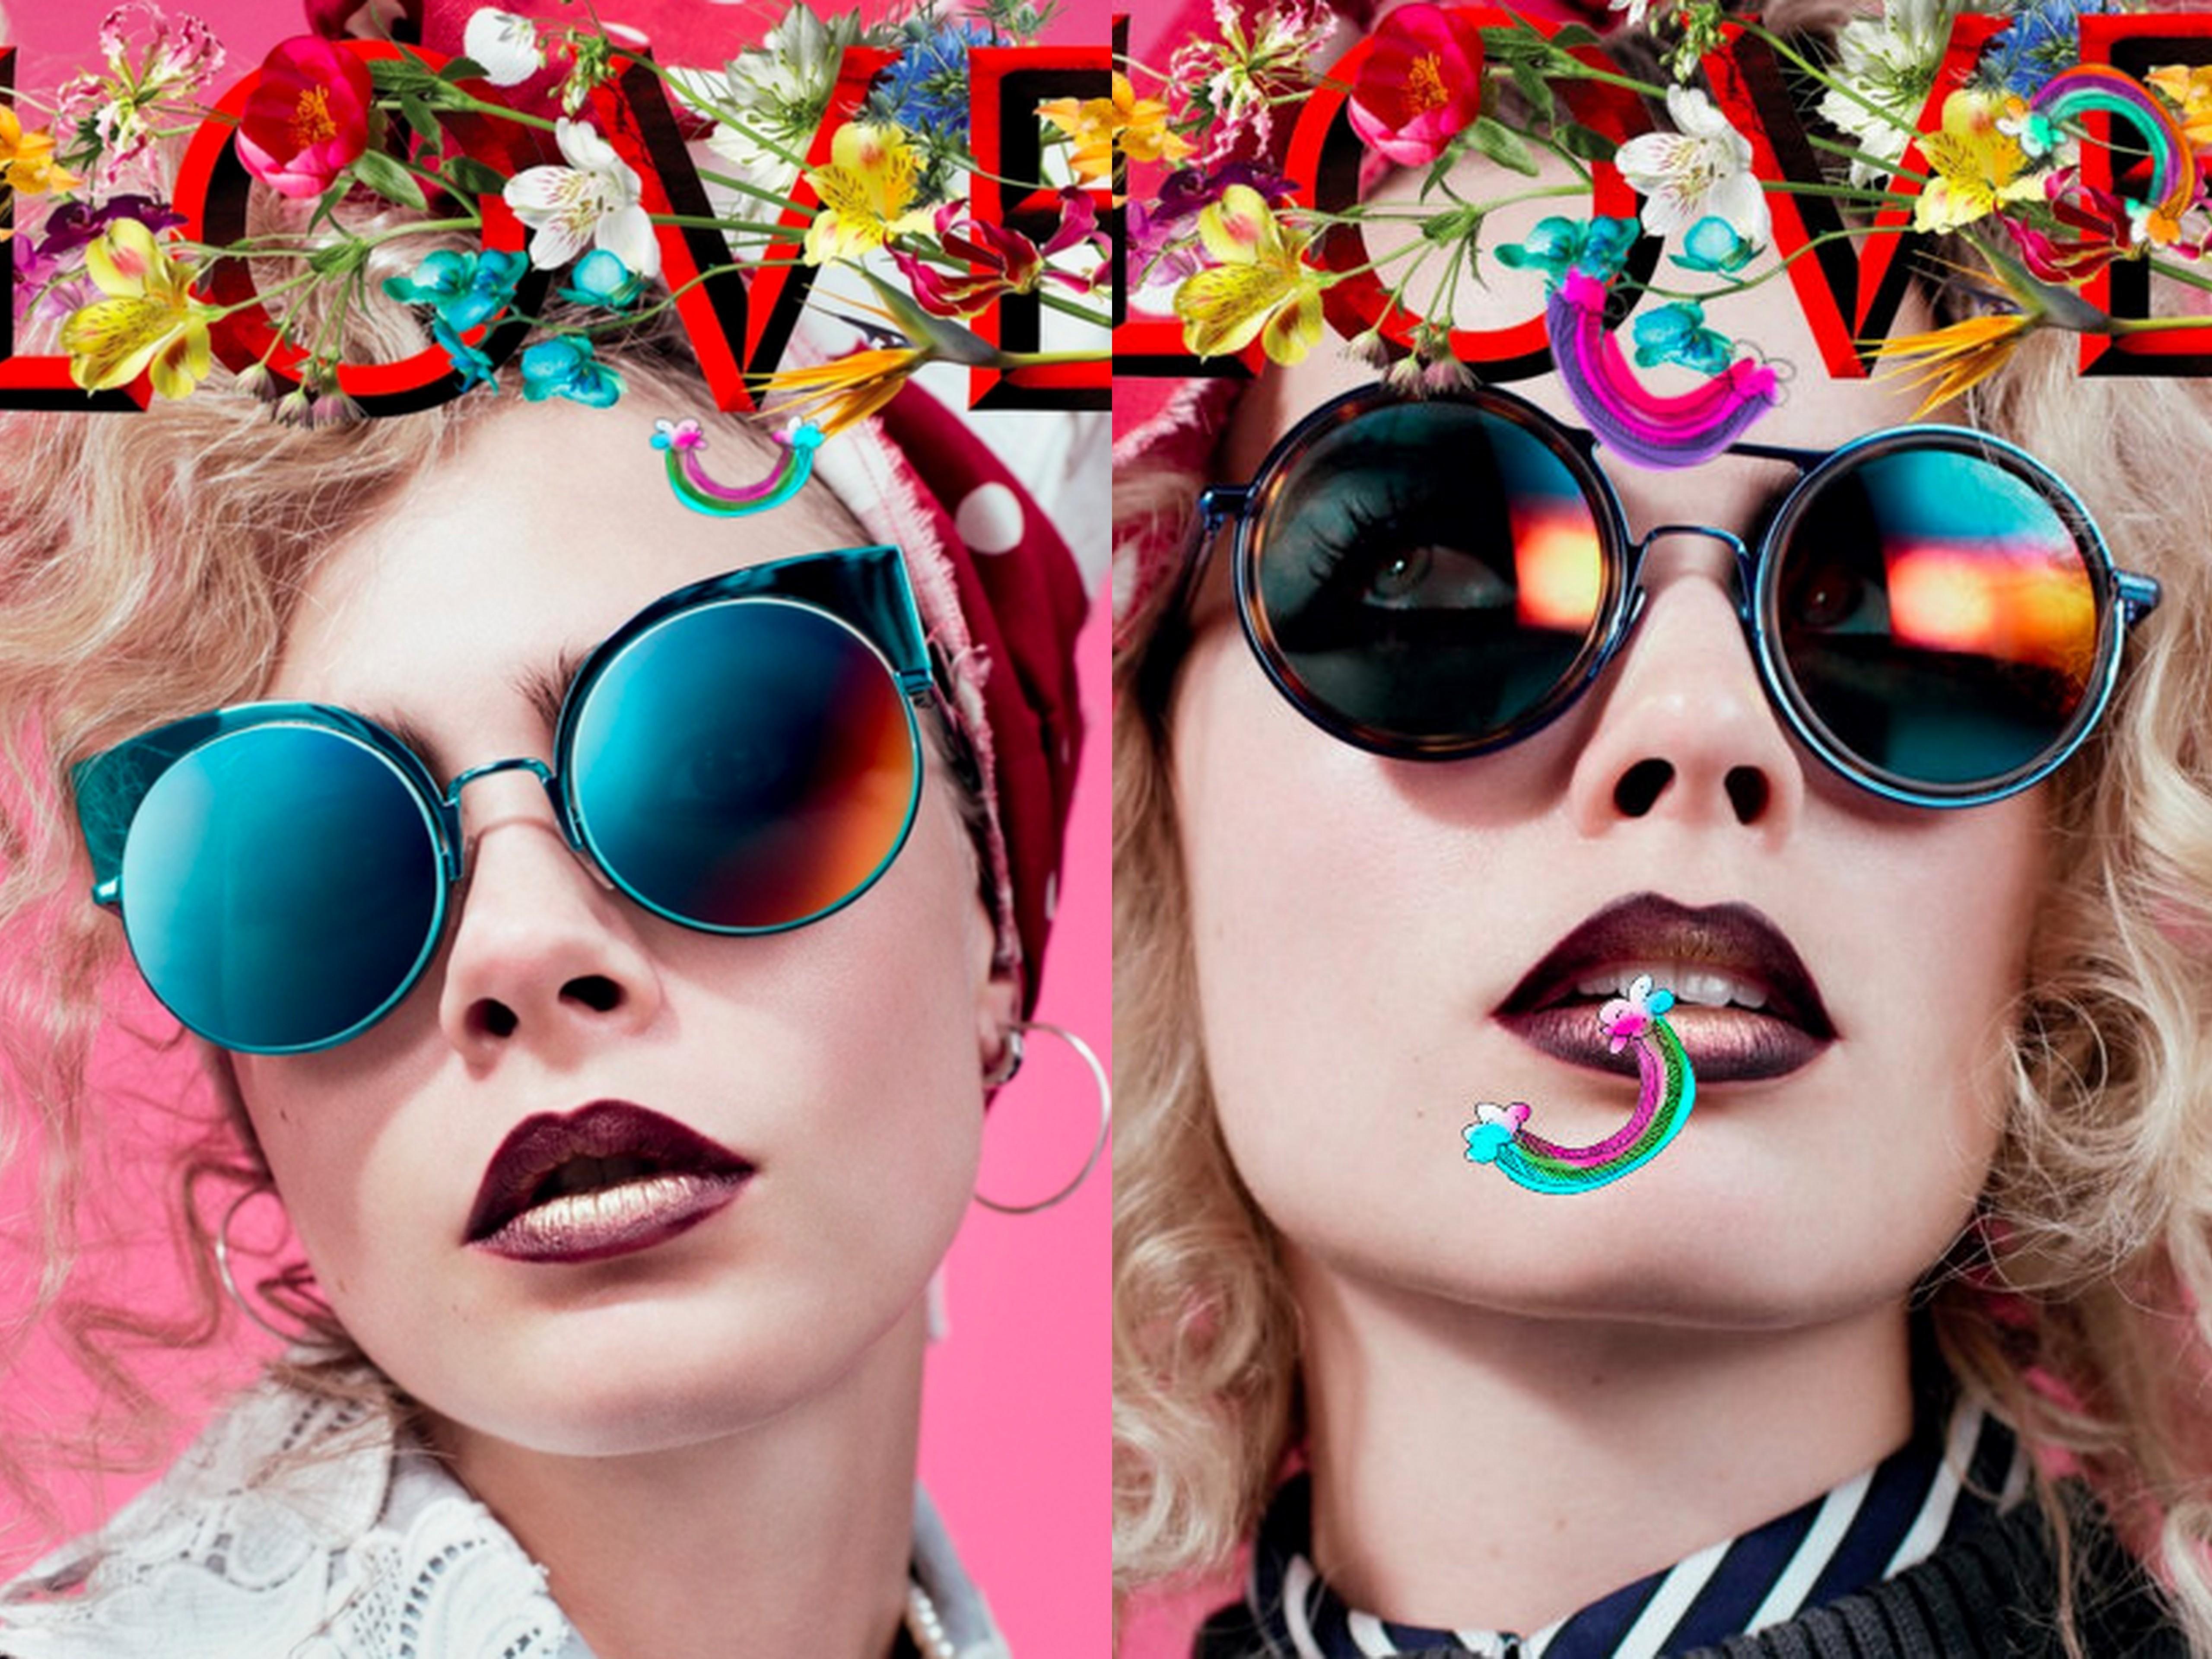 Margot Robbie, Cara Delevingne share Love magazine covers